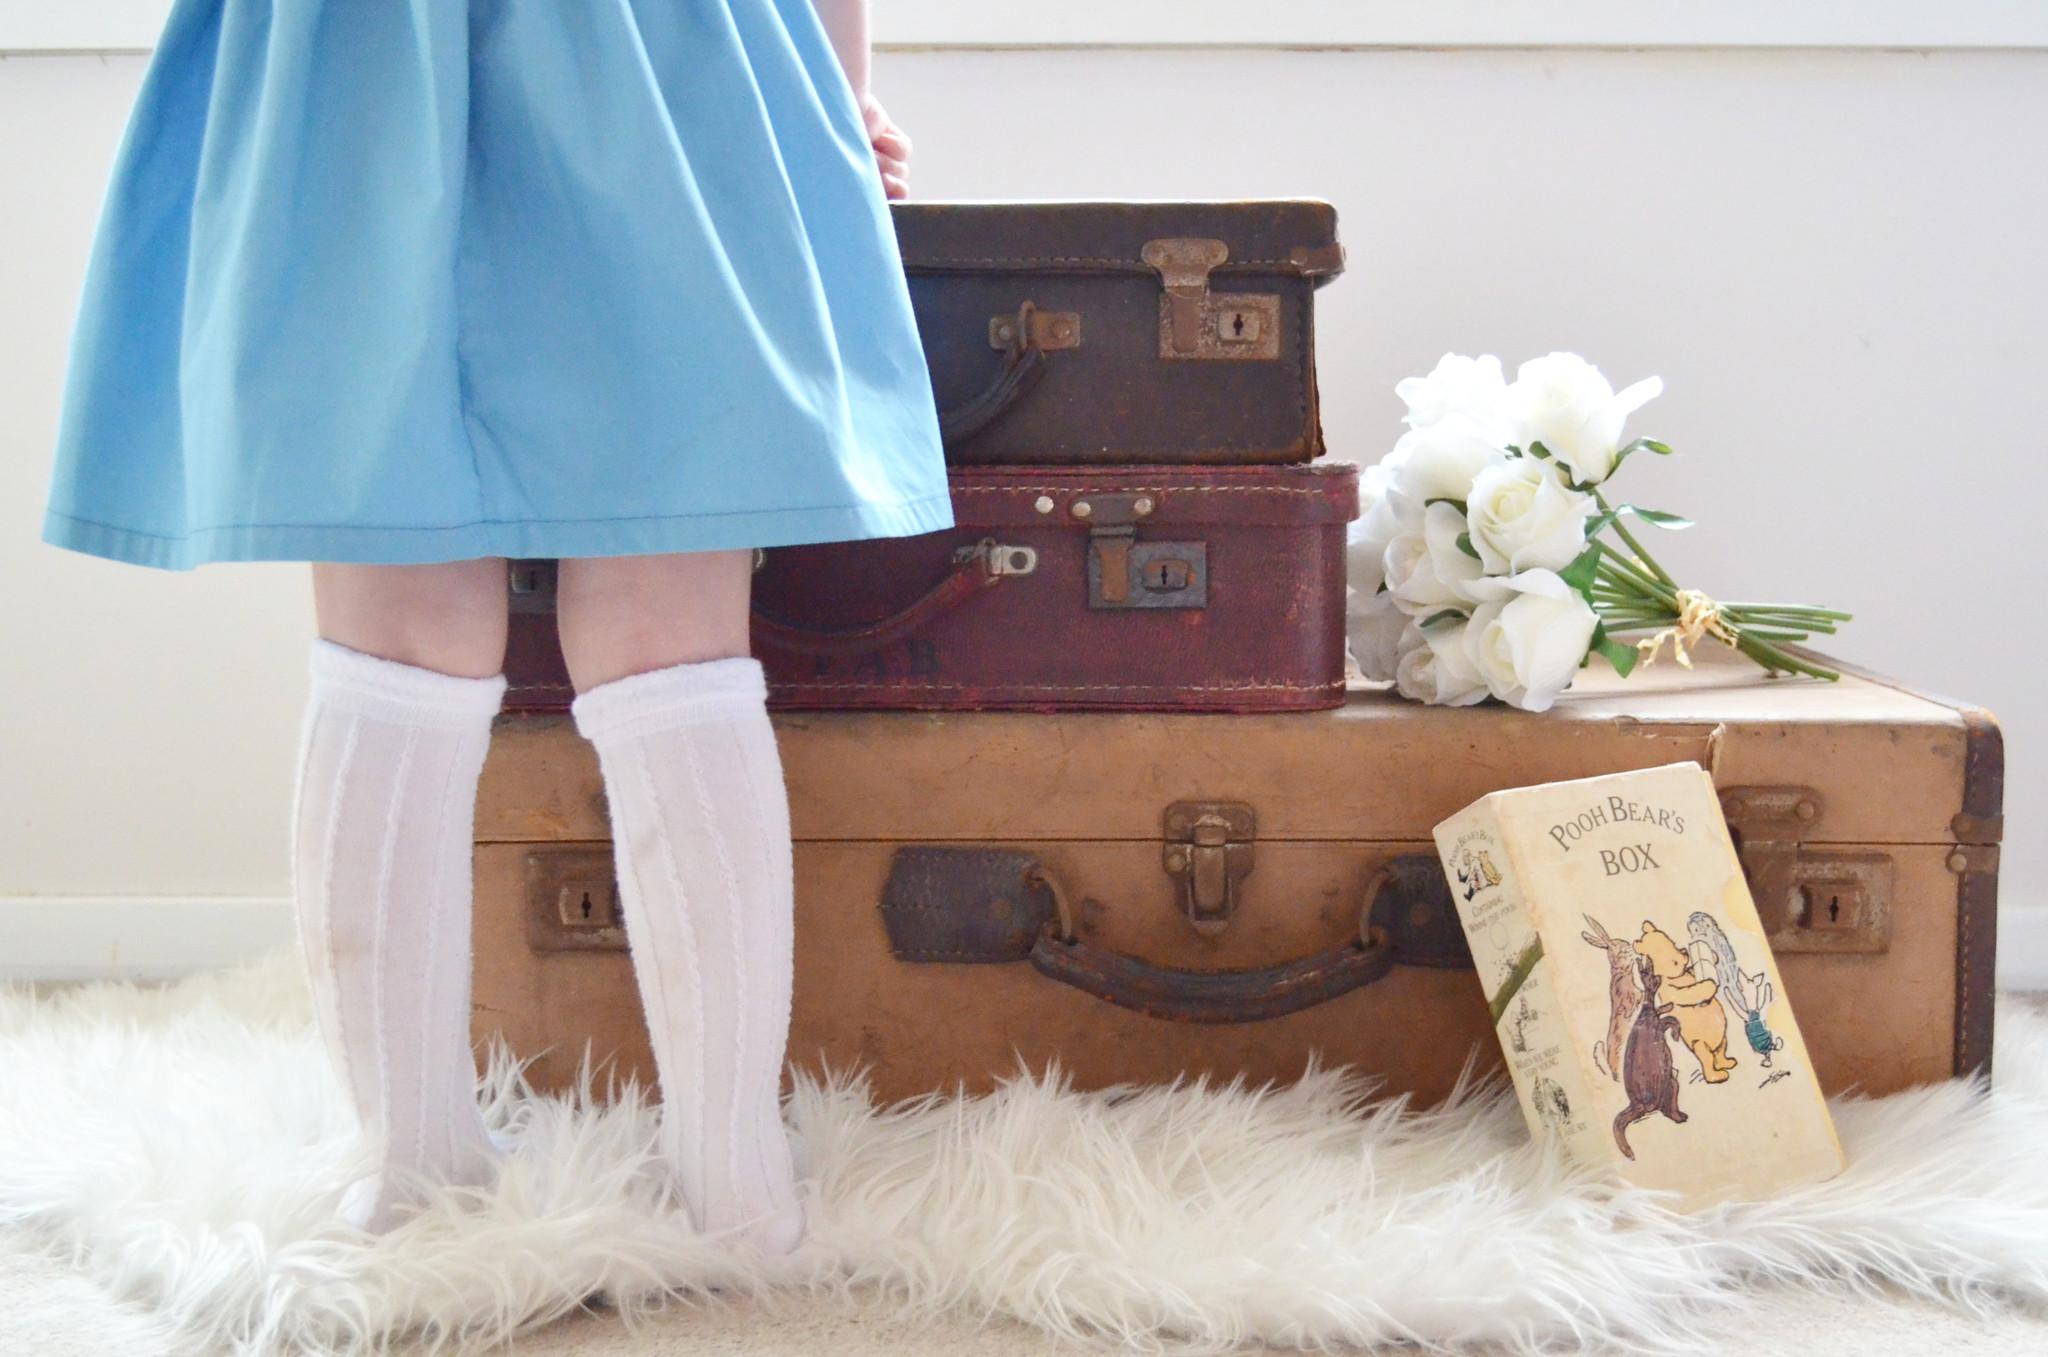 Tights & Leggings